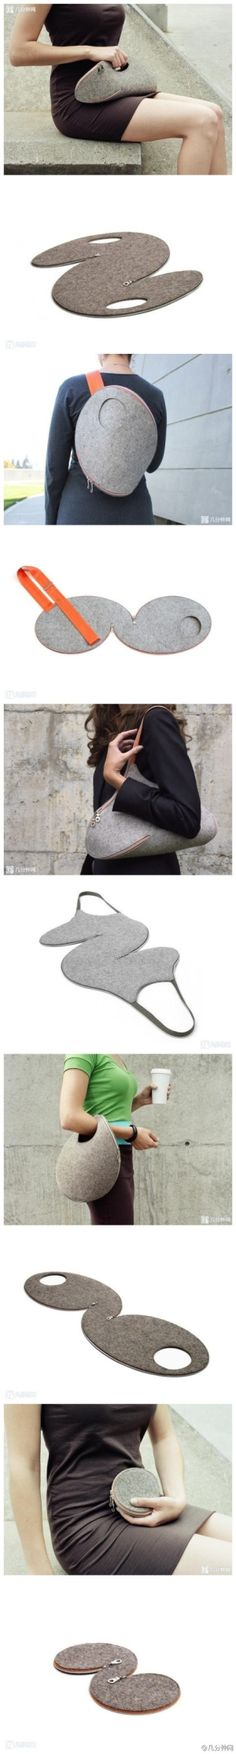 DIY Cool Lady Bag DIY Cool Lady Bag by diyforever